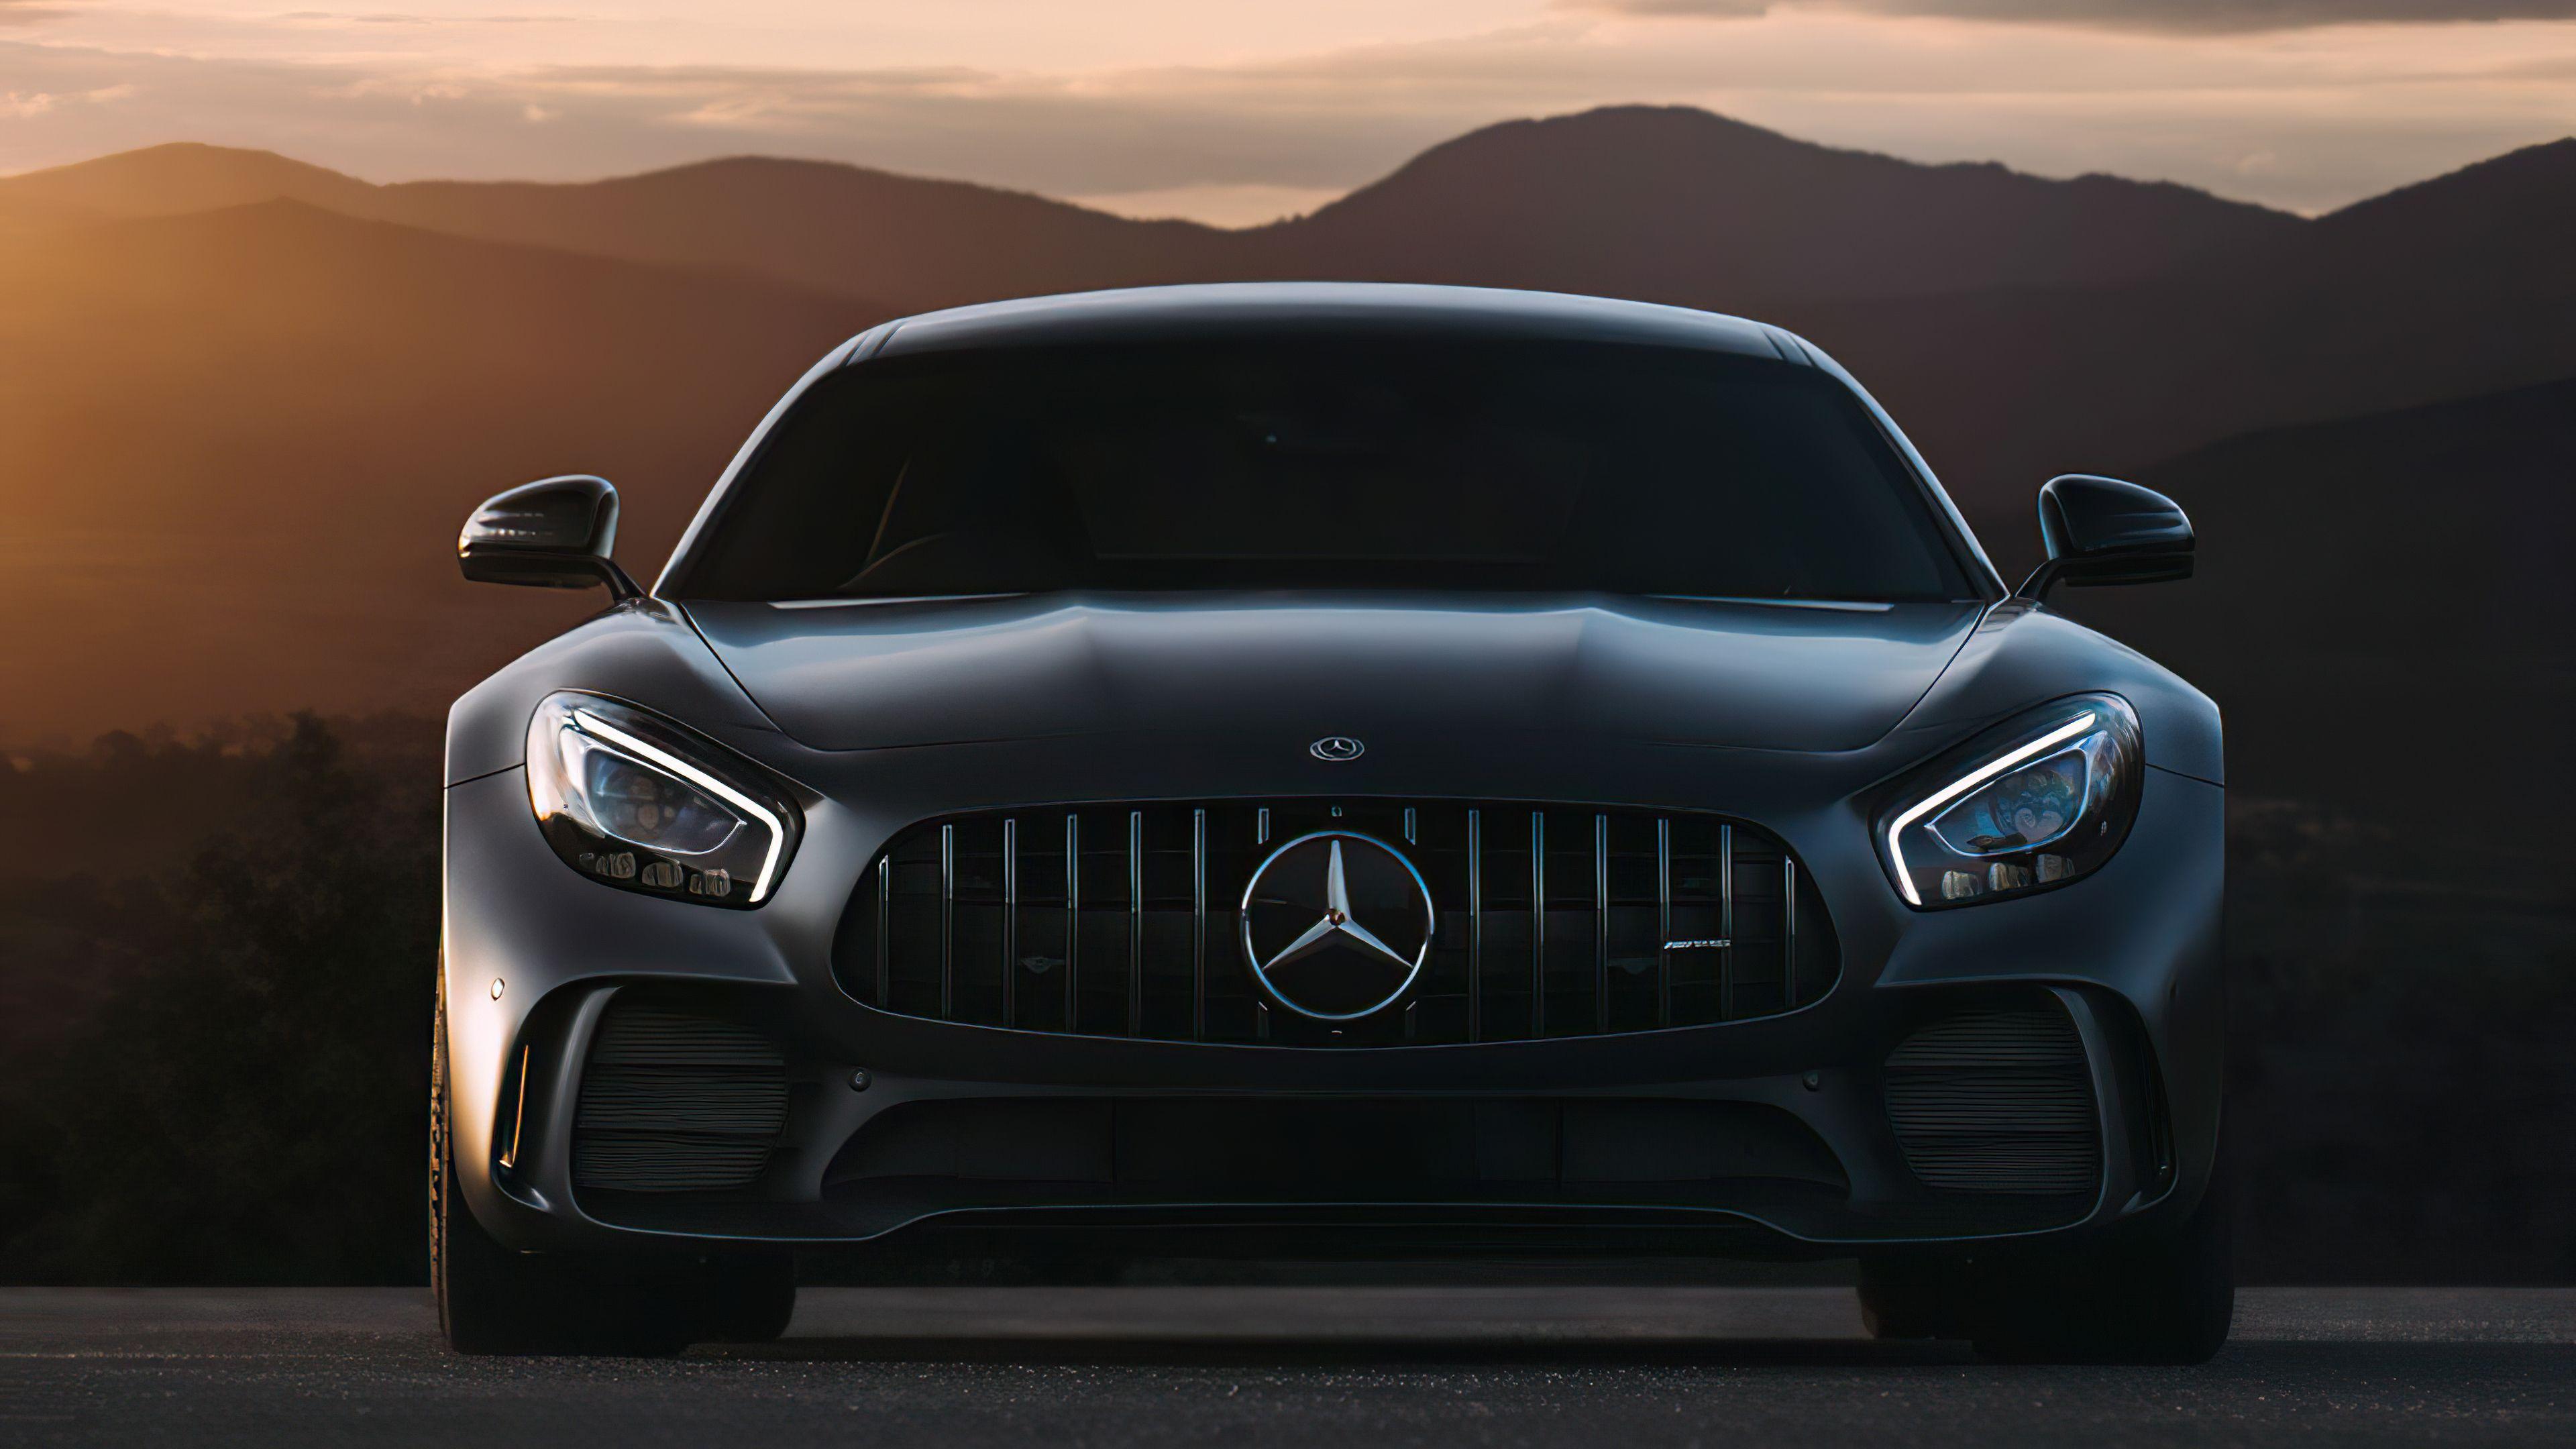 Black Mercedes Benz Amg Gt 2020 4k Black Mercedes Benz Amg Gt 2020 4k Wallpapers In 2021 Mercedes Benz Amg Mercedes Benz Cars Mercedes Benz Wallpaper